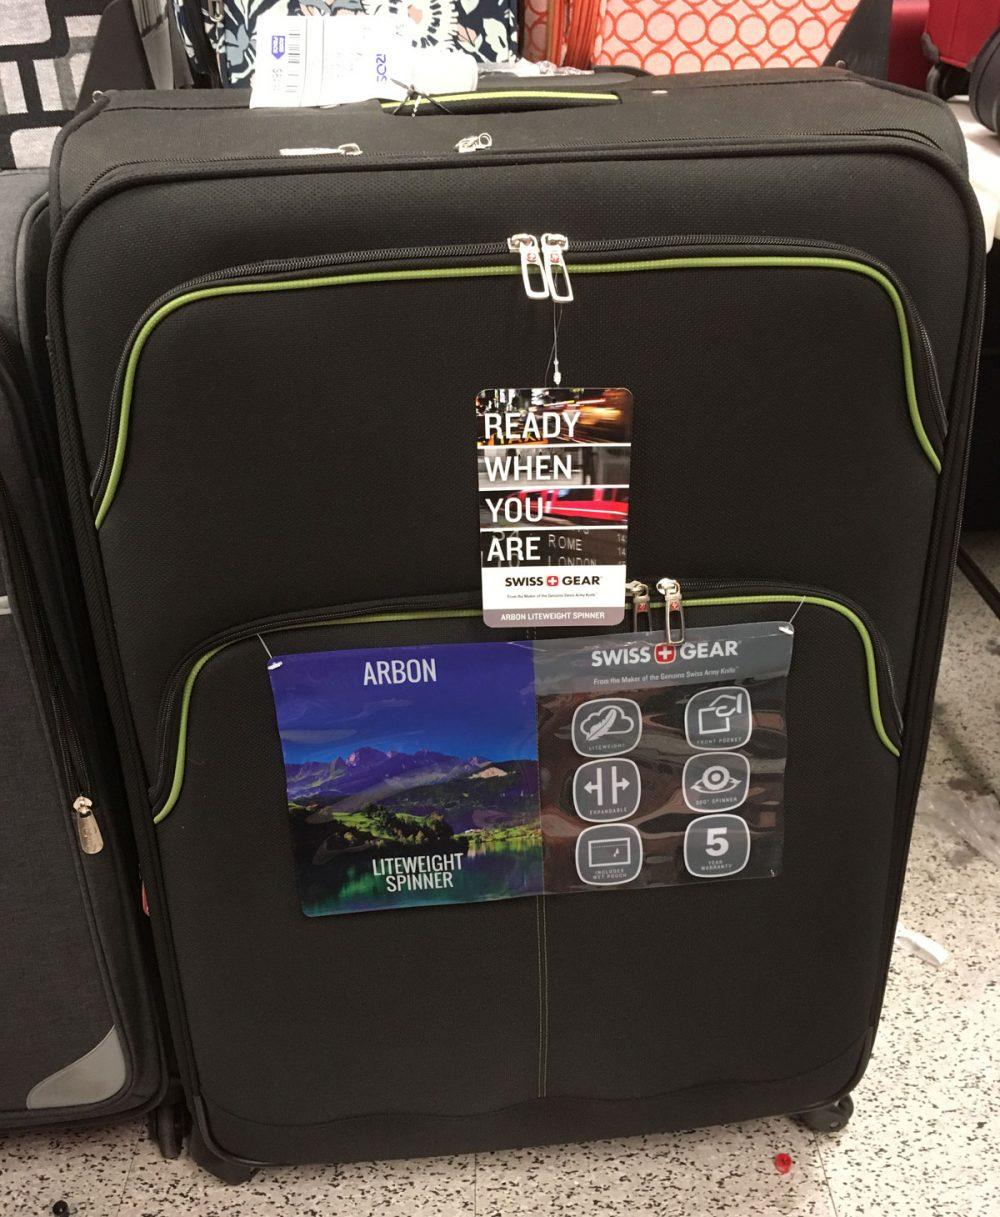 Swiss GearのARBON軽量スピナースーツケース ロスドレスフォーレス